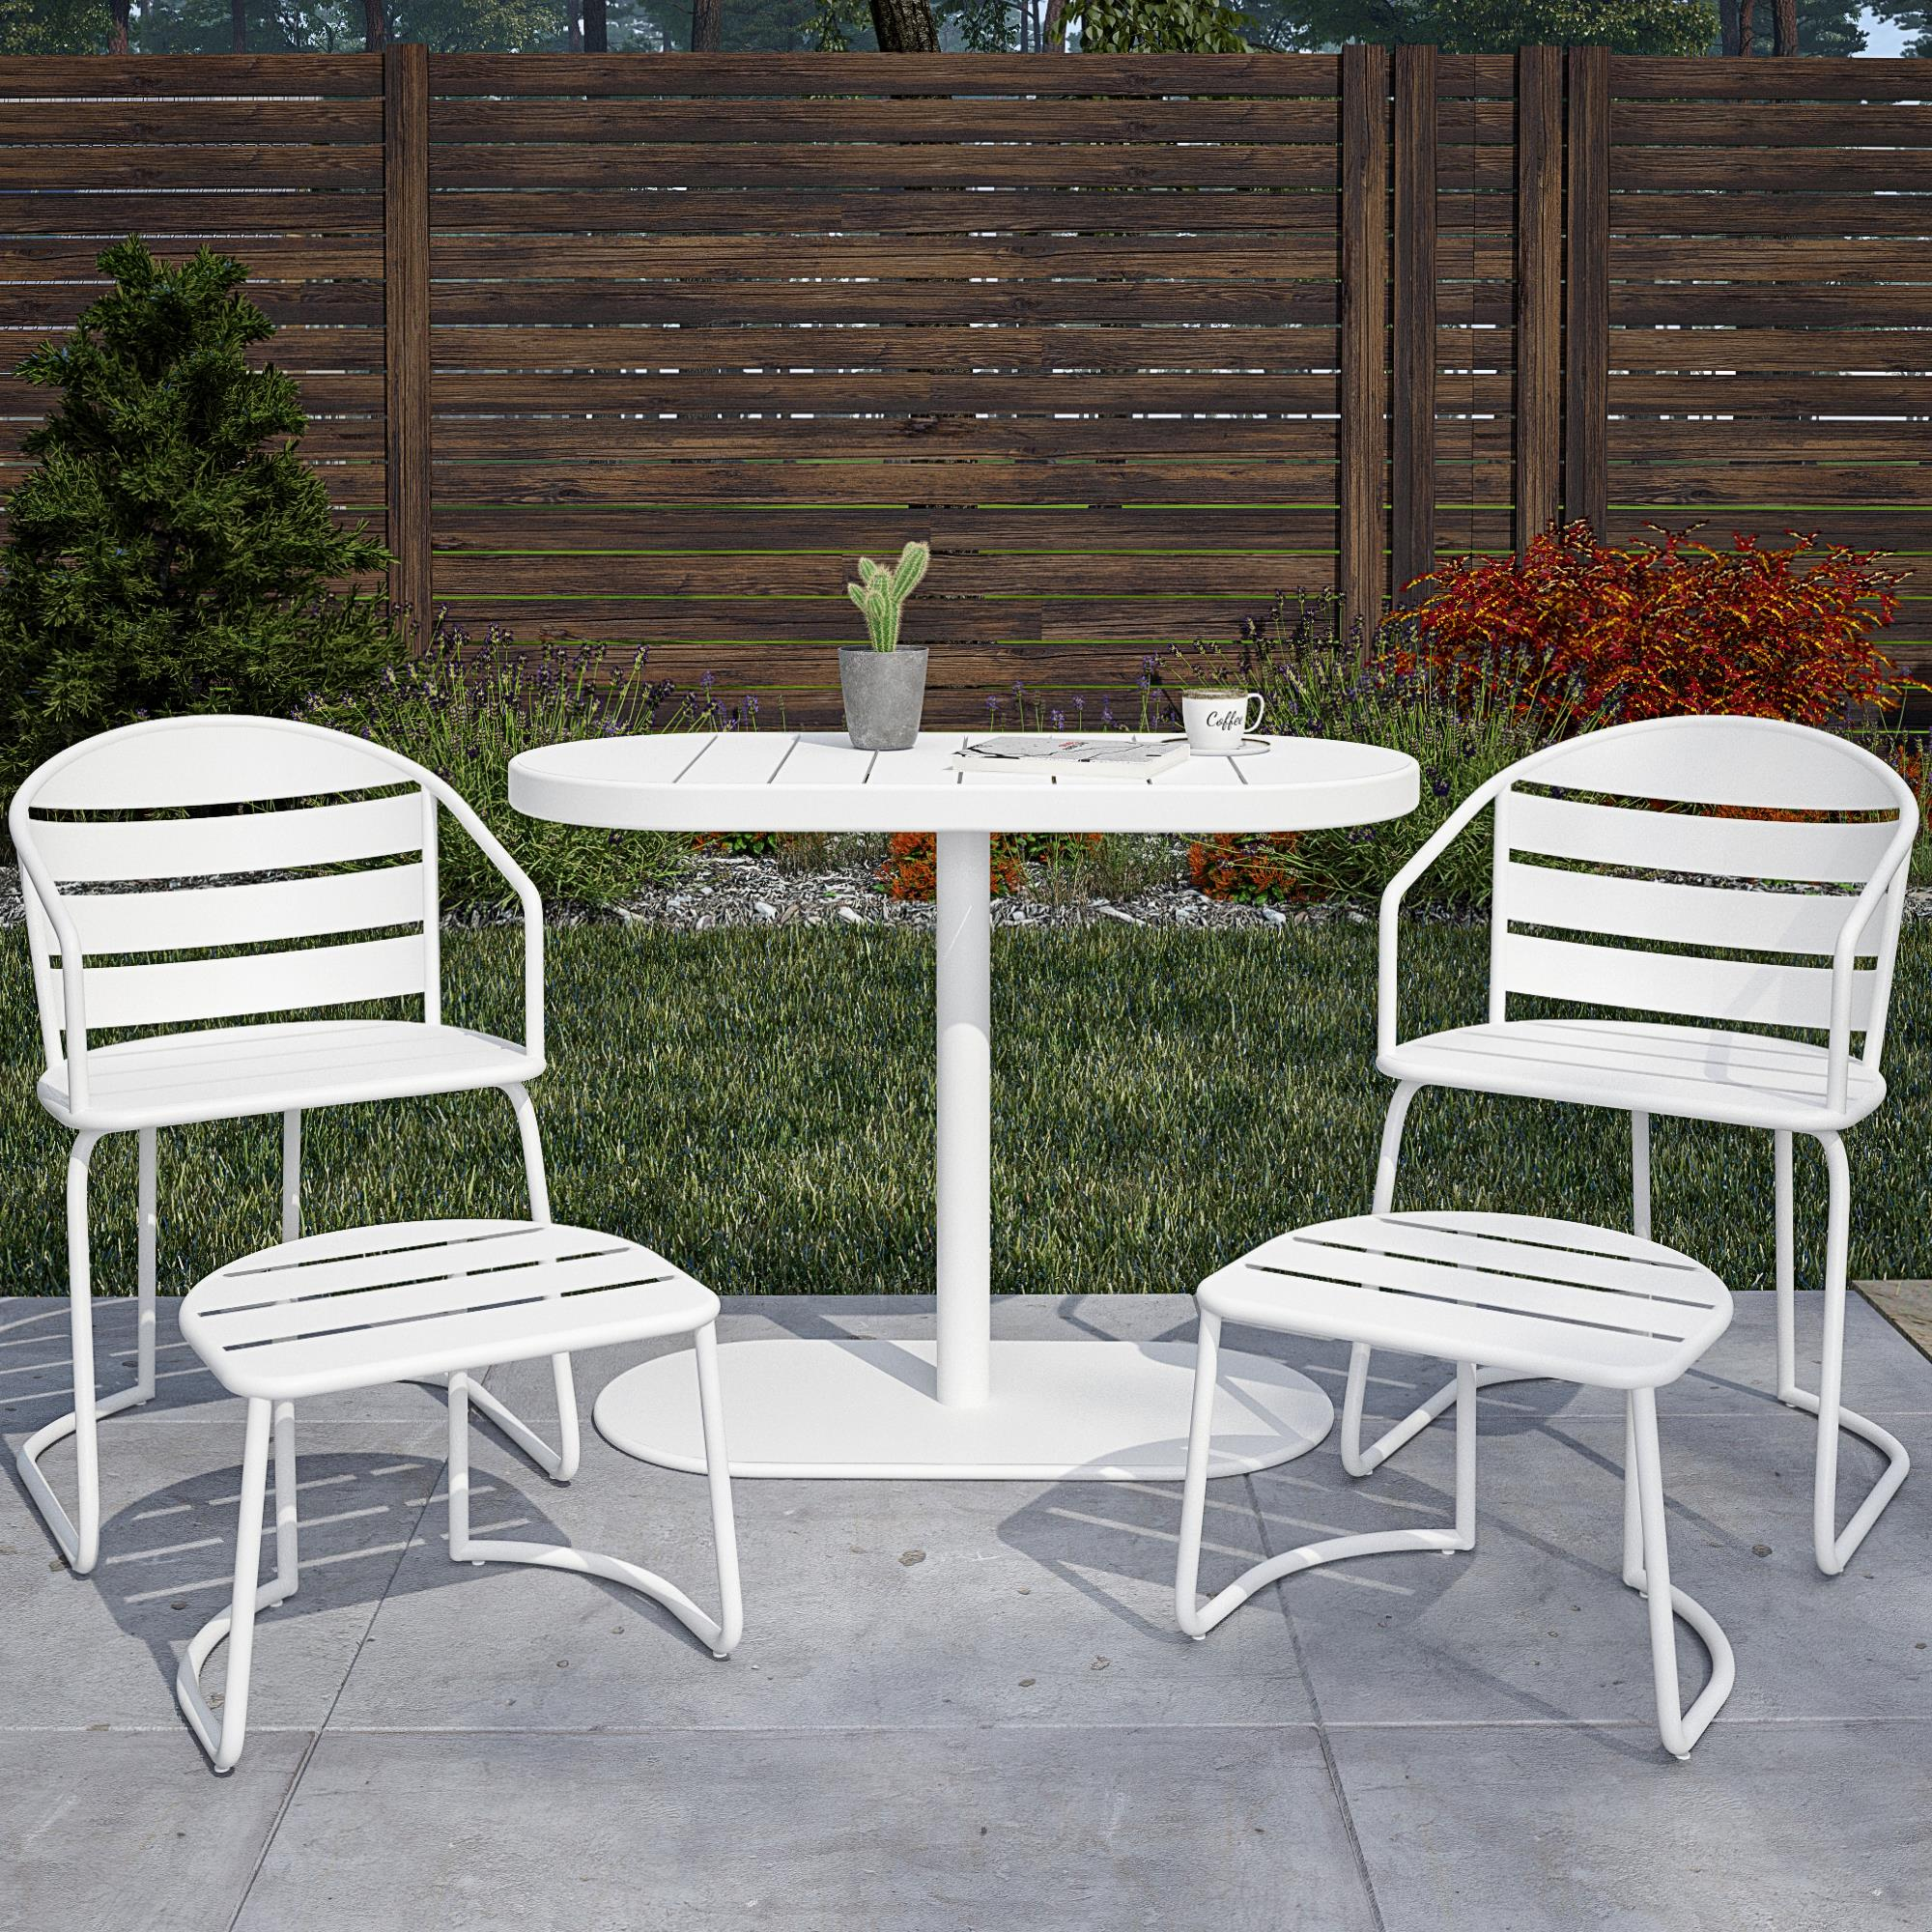 COSCO Outdoor Furniture, 5 Piece Patio Bistro Set, 2 Bistro Chairs